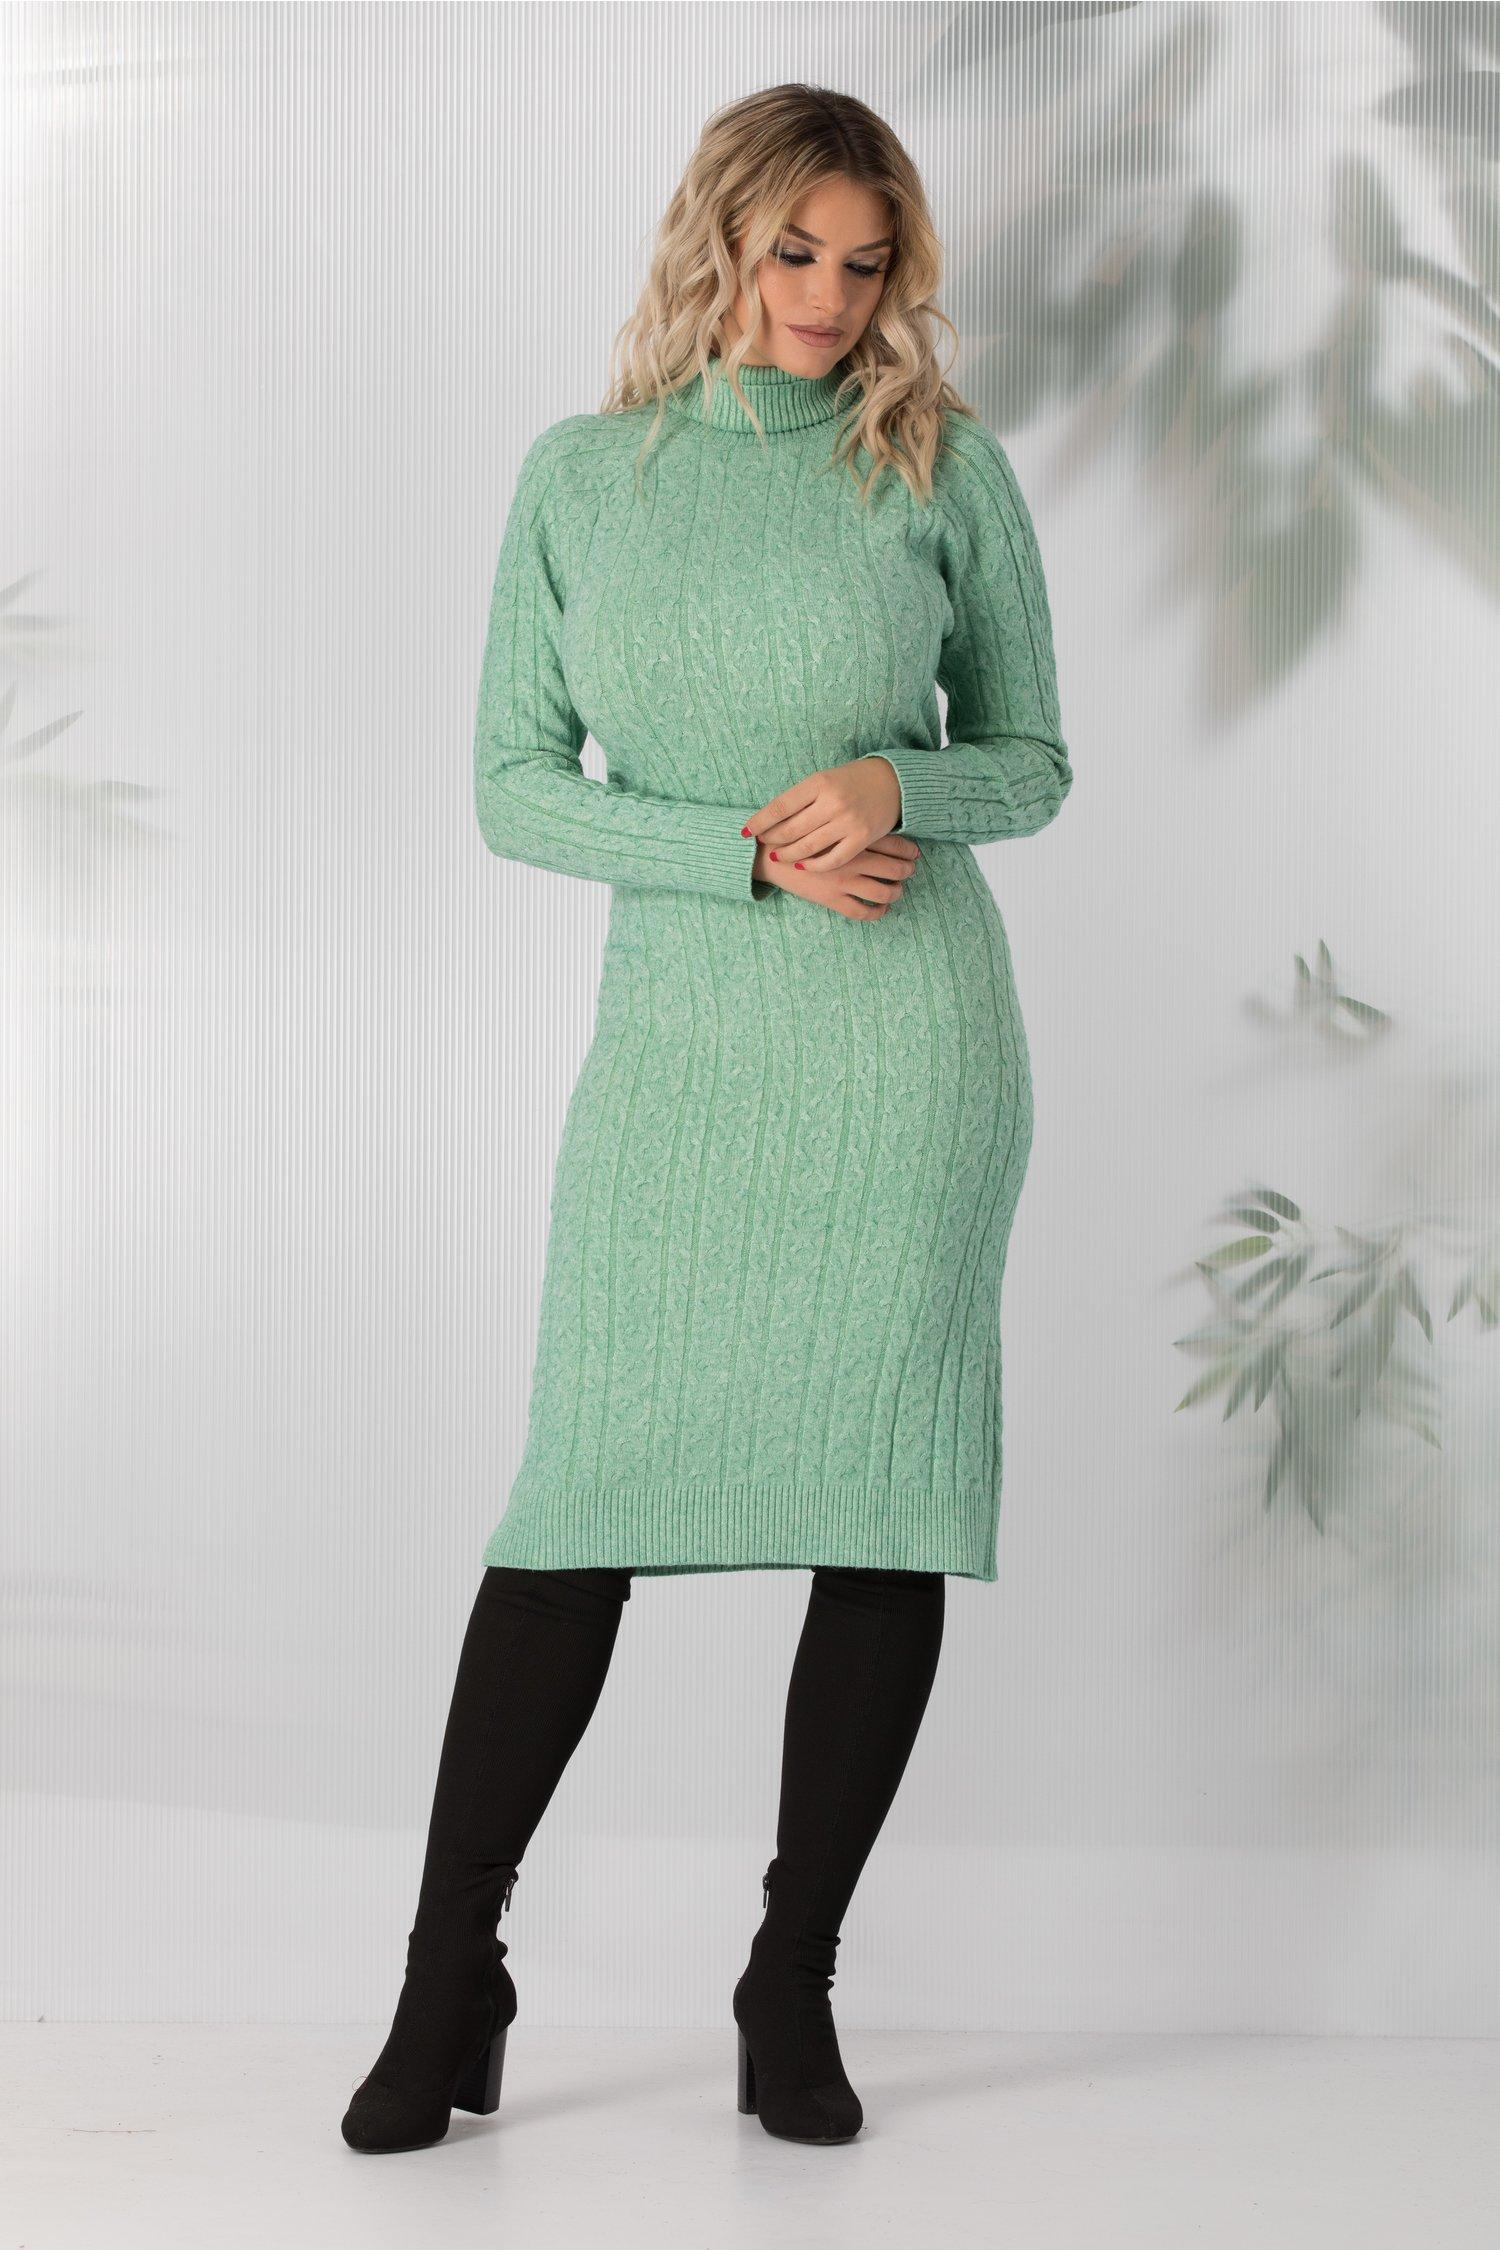 Rochie Paula verde mint lunga din tricot